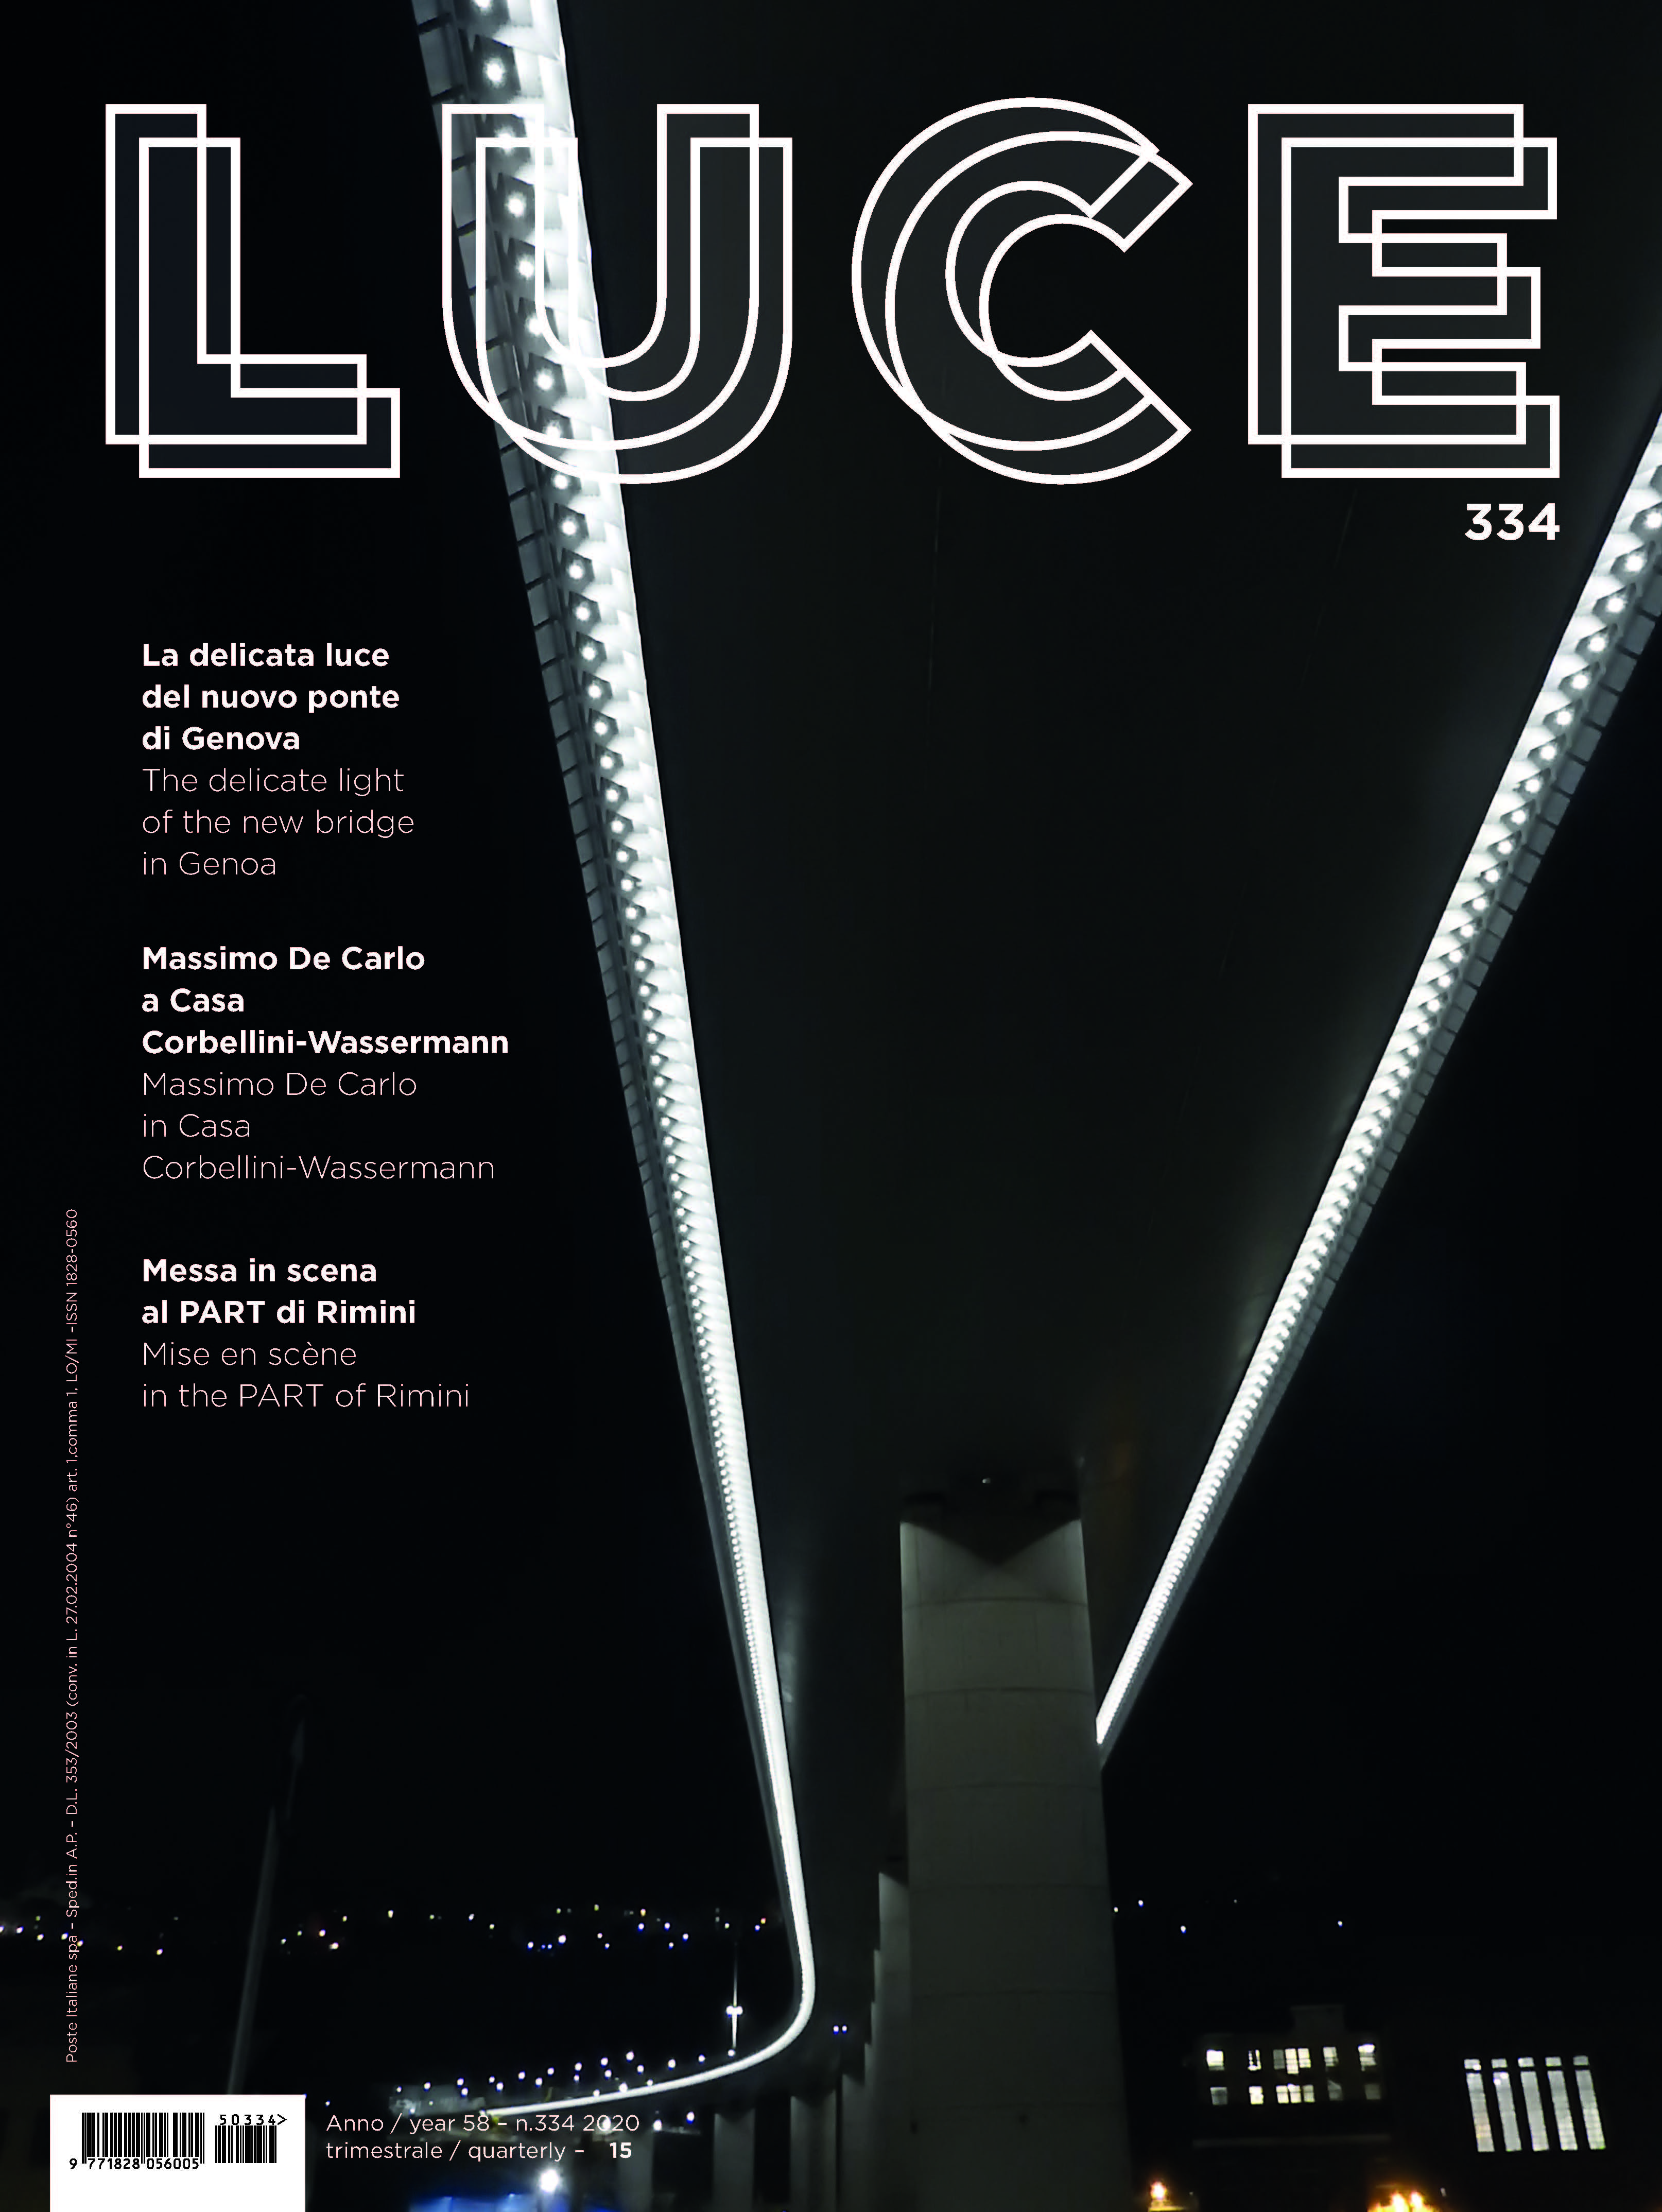 Pagine da LUCE 334_Giansante, Gareri, Di Lecce, Frascarolo, Mancinelli, Rossi_Life-Diademe-2